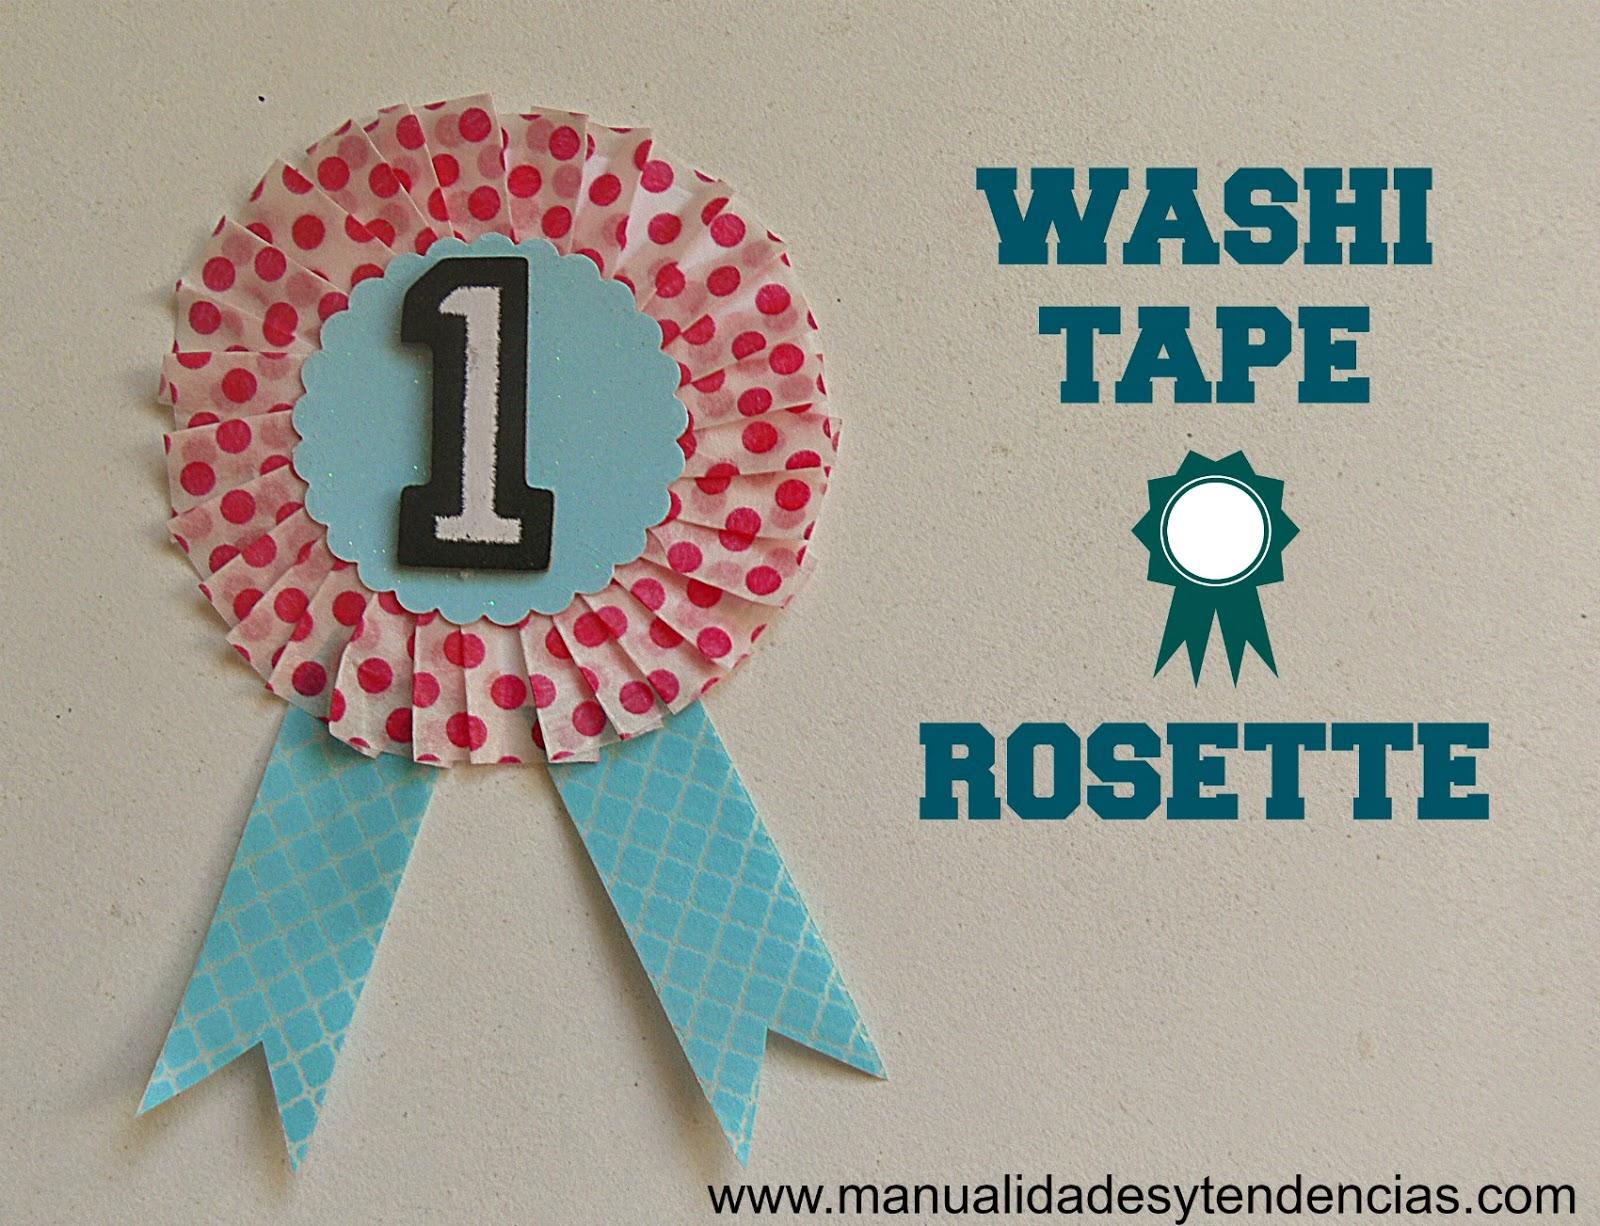 Washi tape rosette tutorial